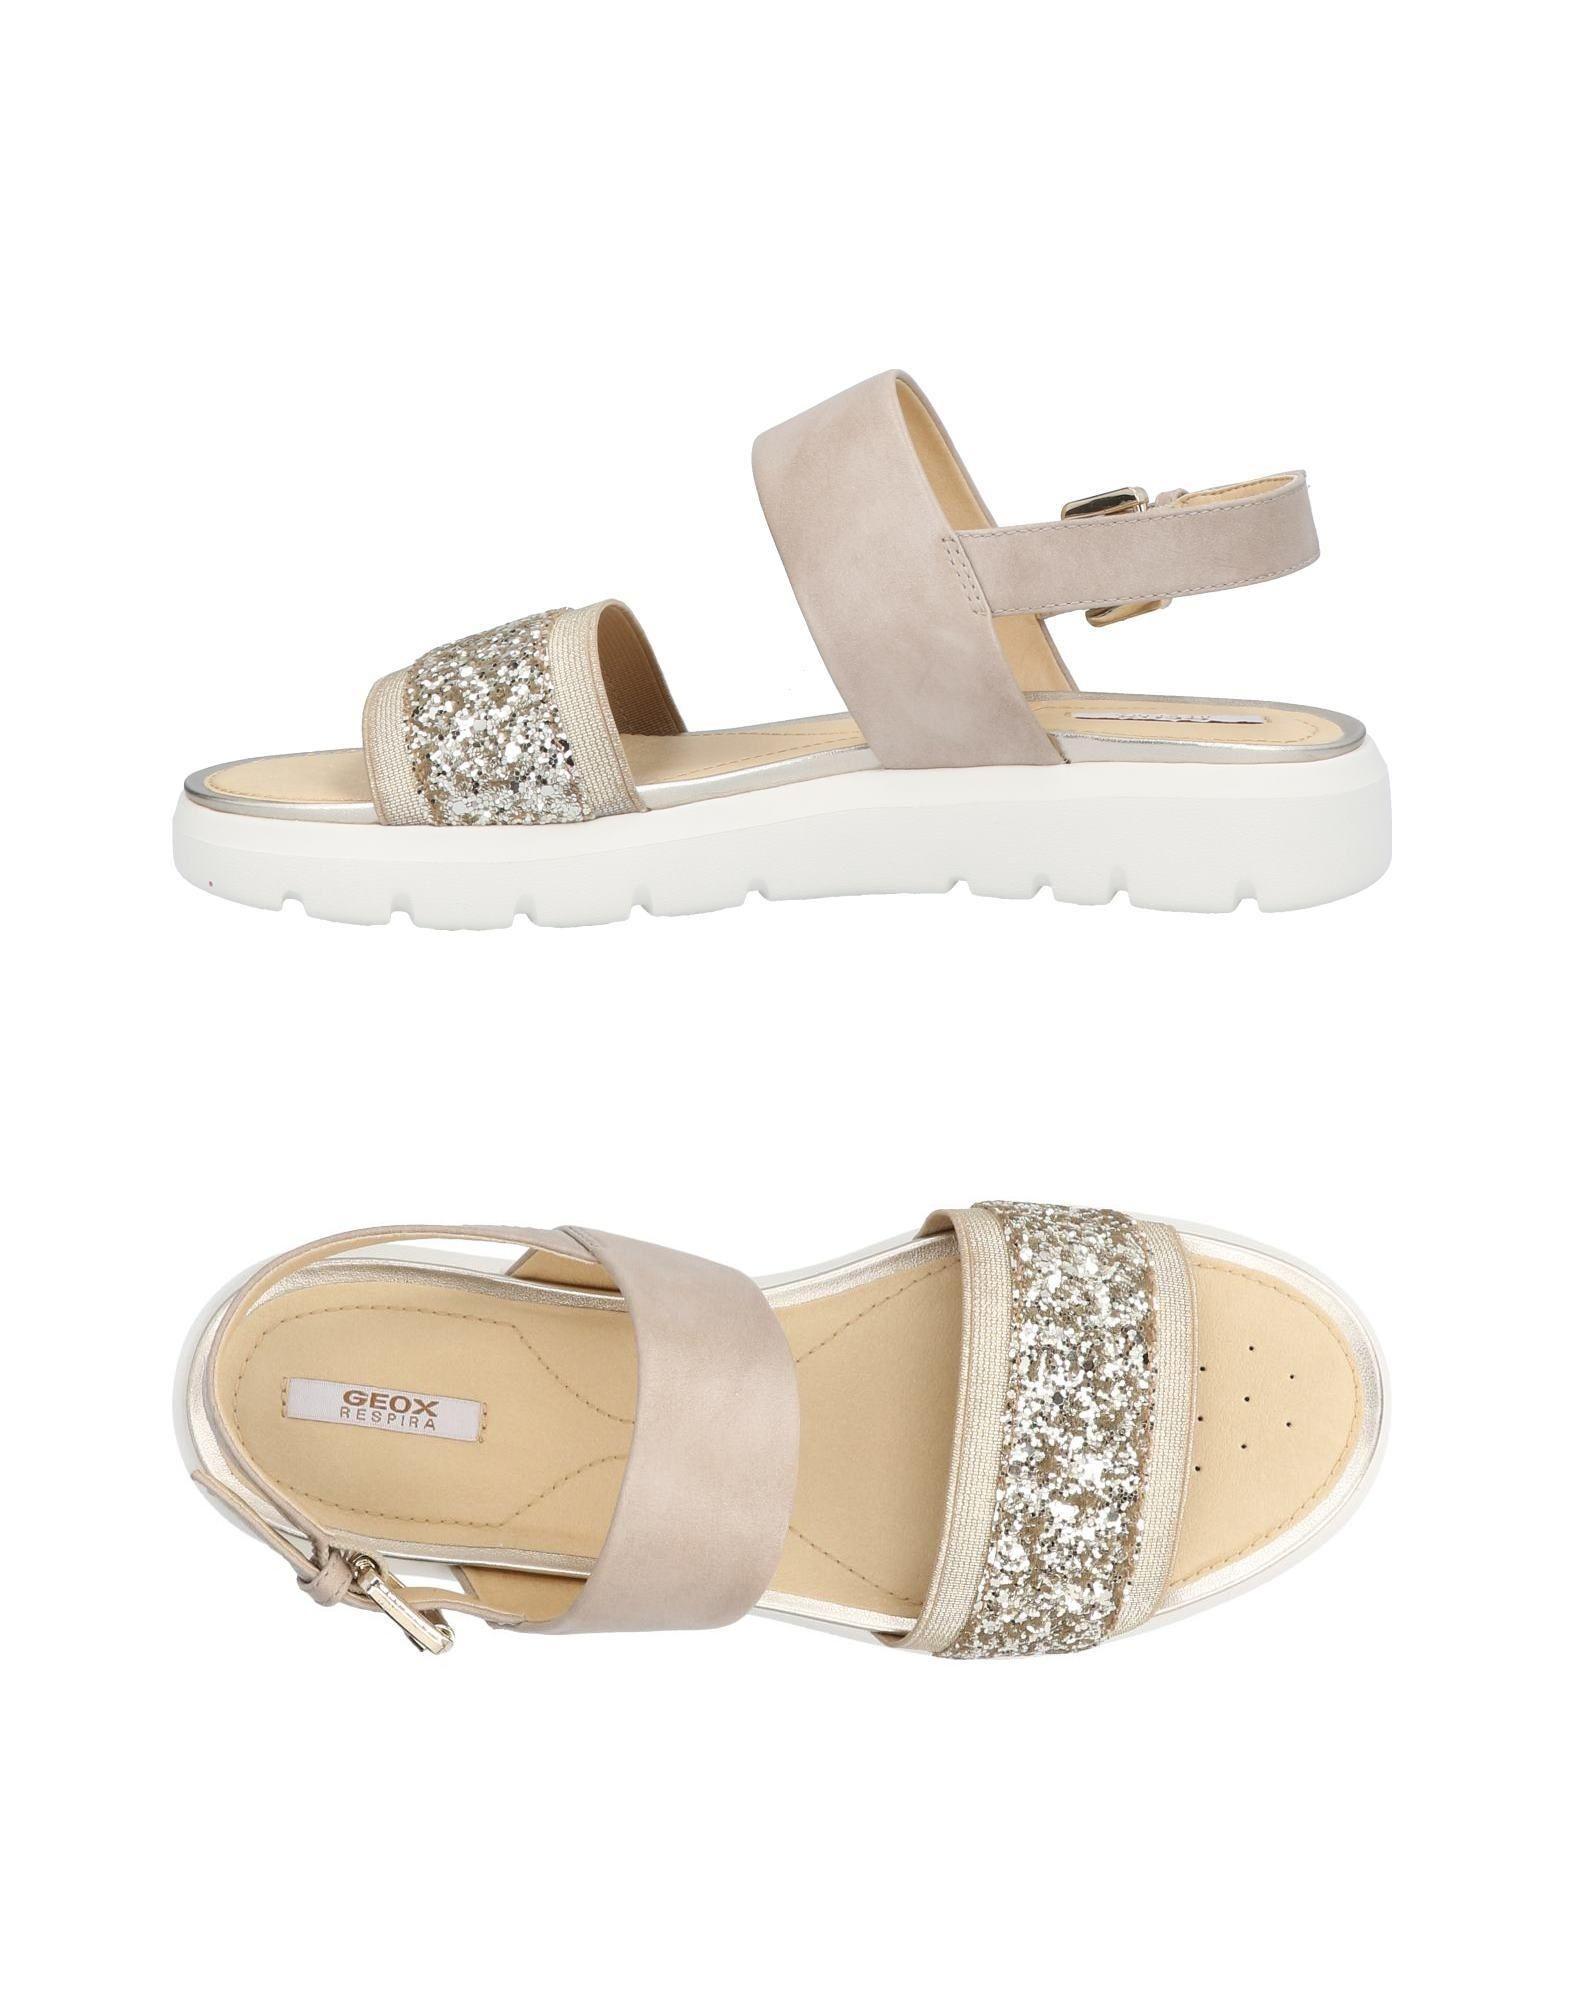 Geox Sandalen Damen  11453920QR Gute Qualität beliebte Schuhe